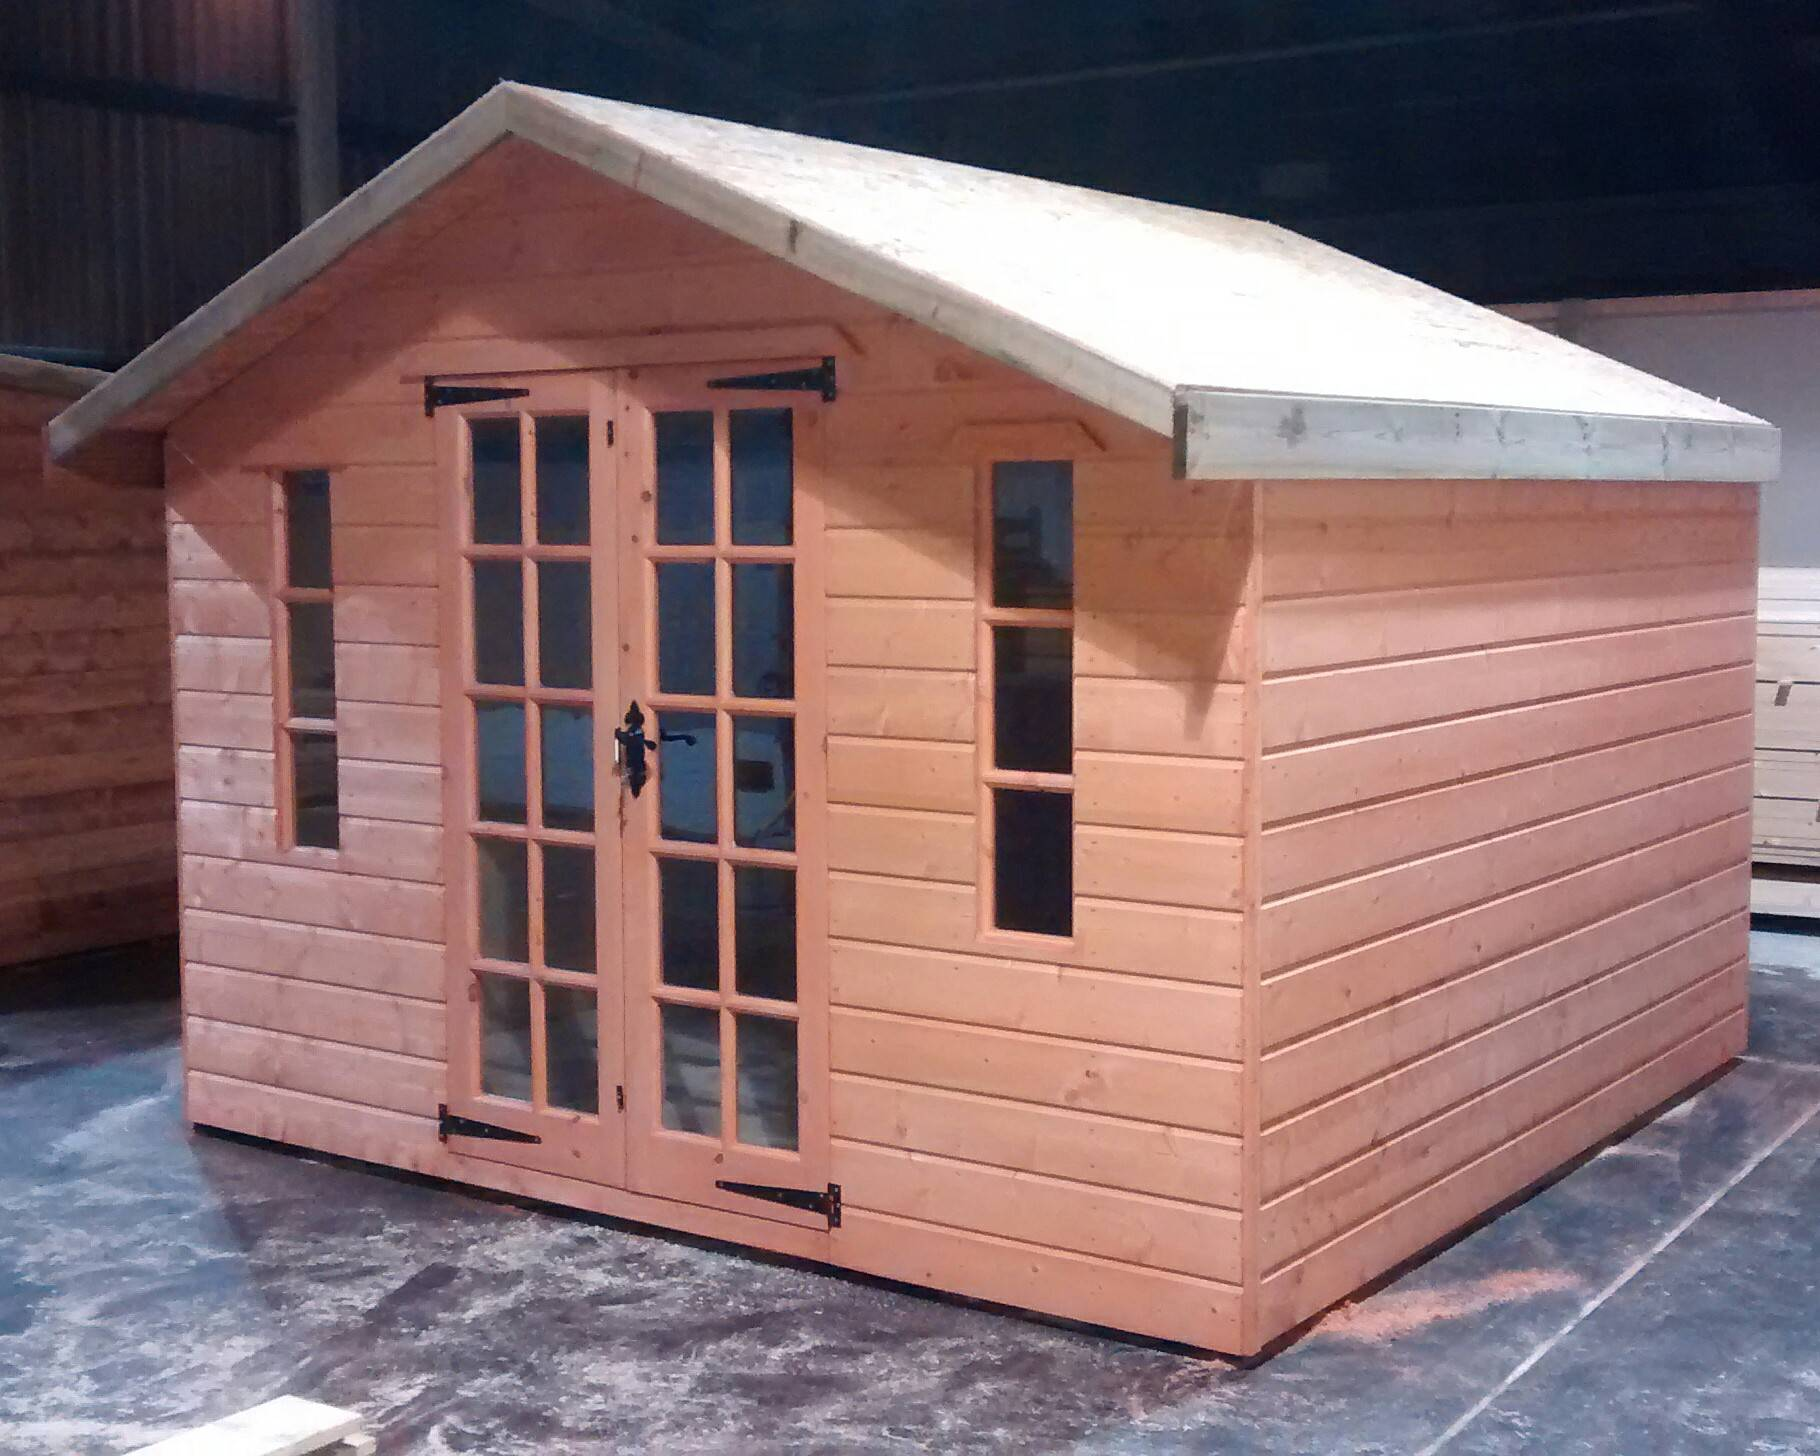 Summer House (10' x 10')